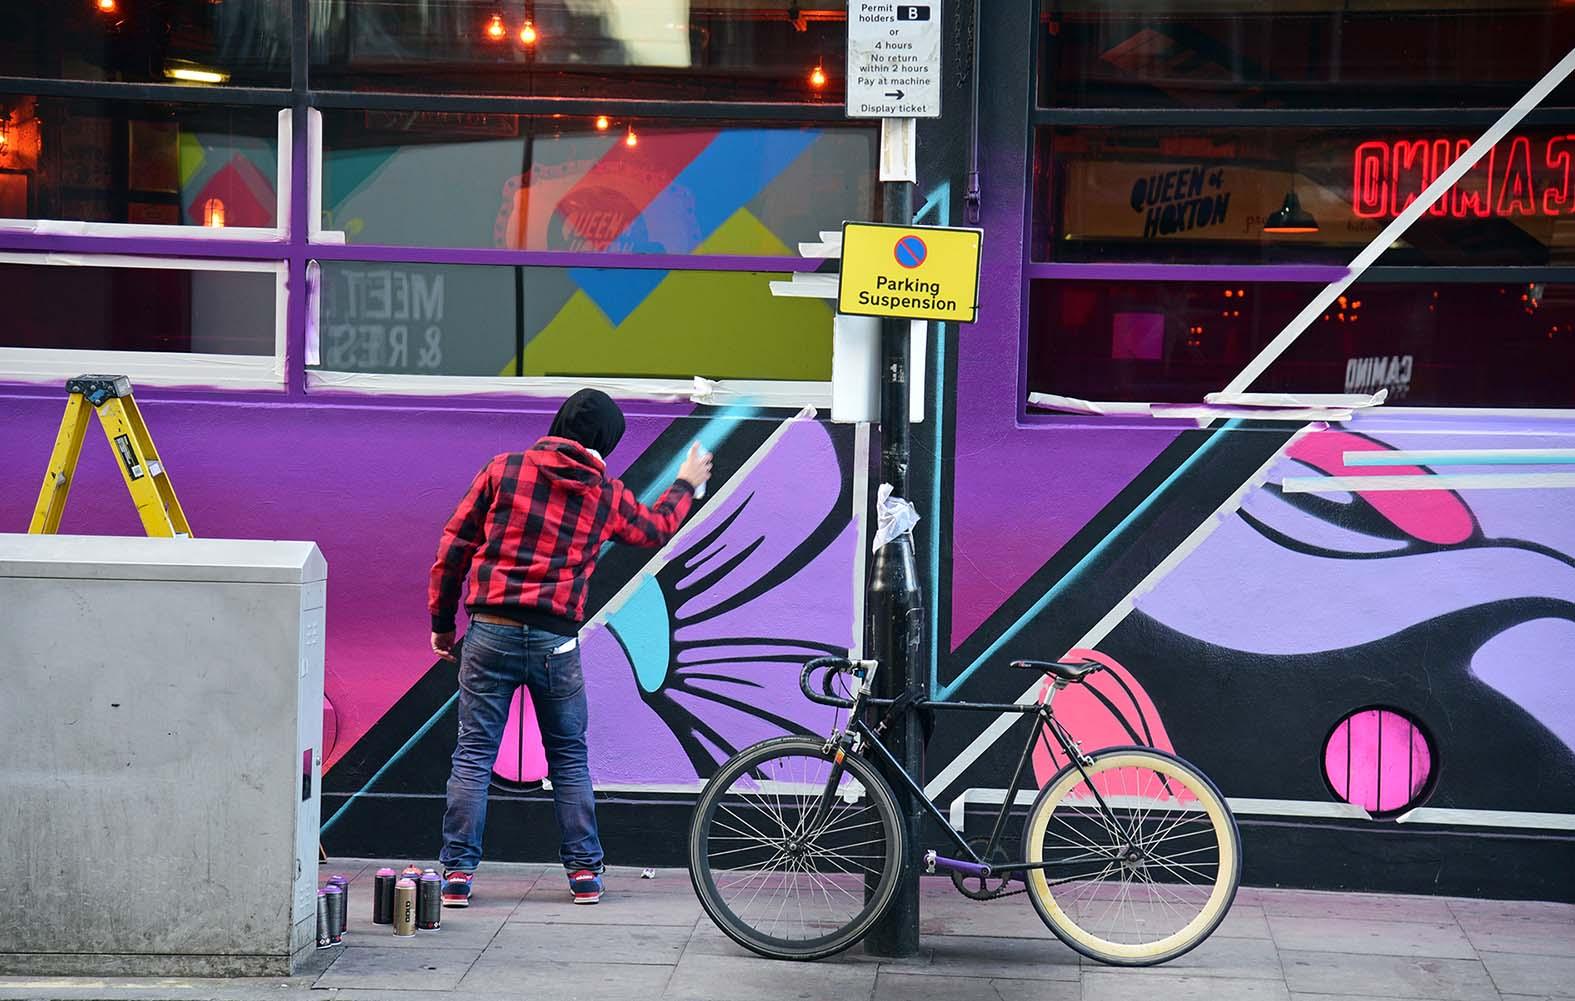 Nerone,street-art-queen-o-hoxton-london 11